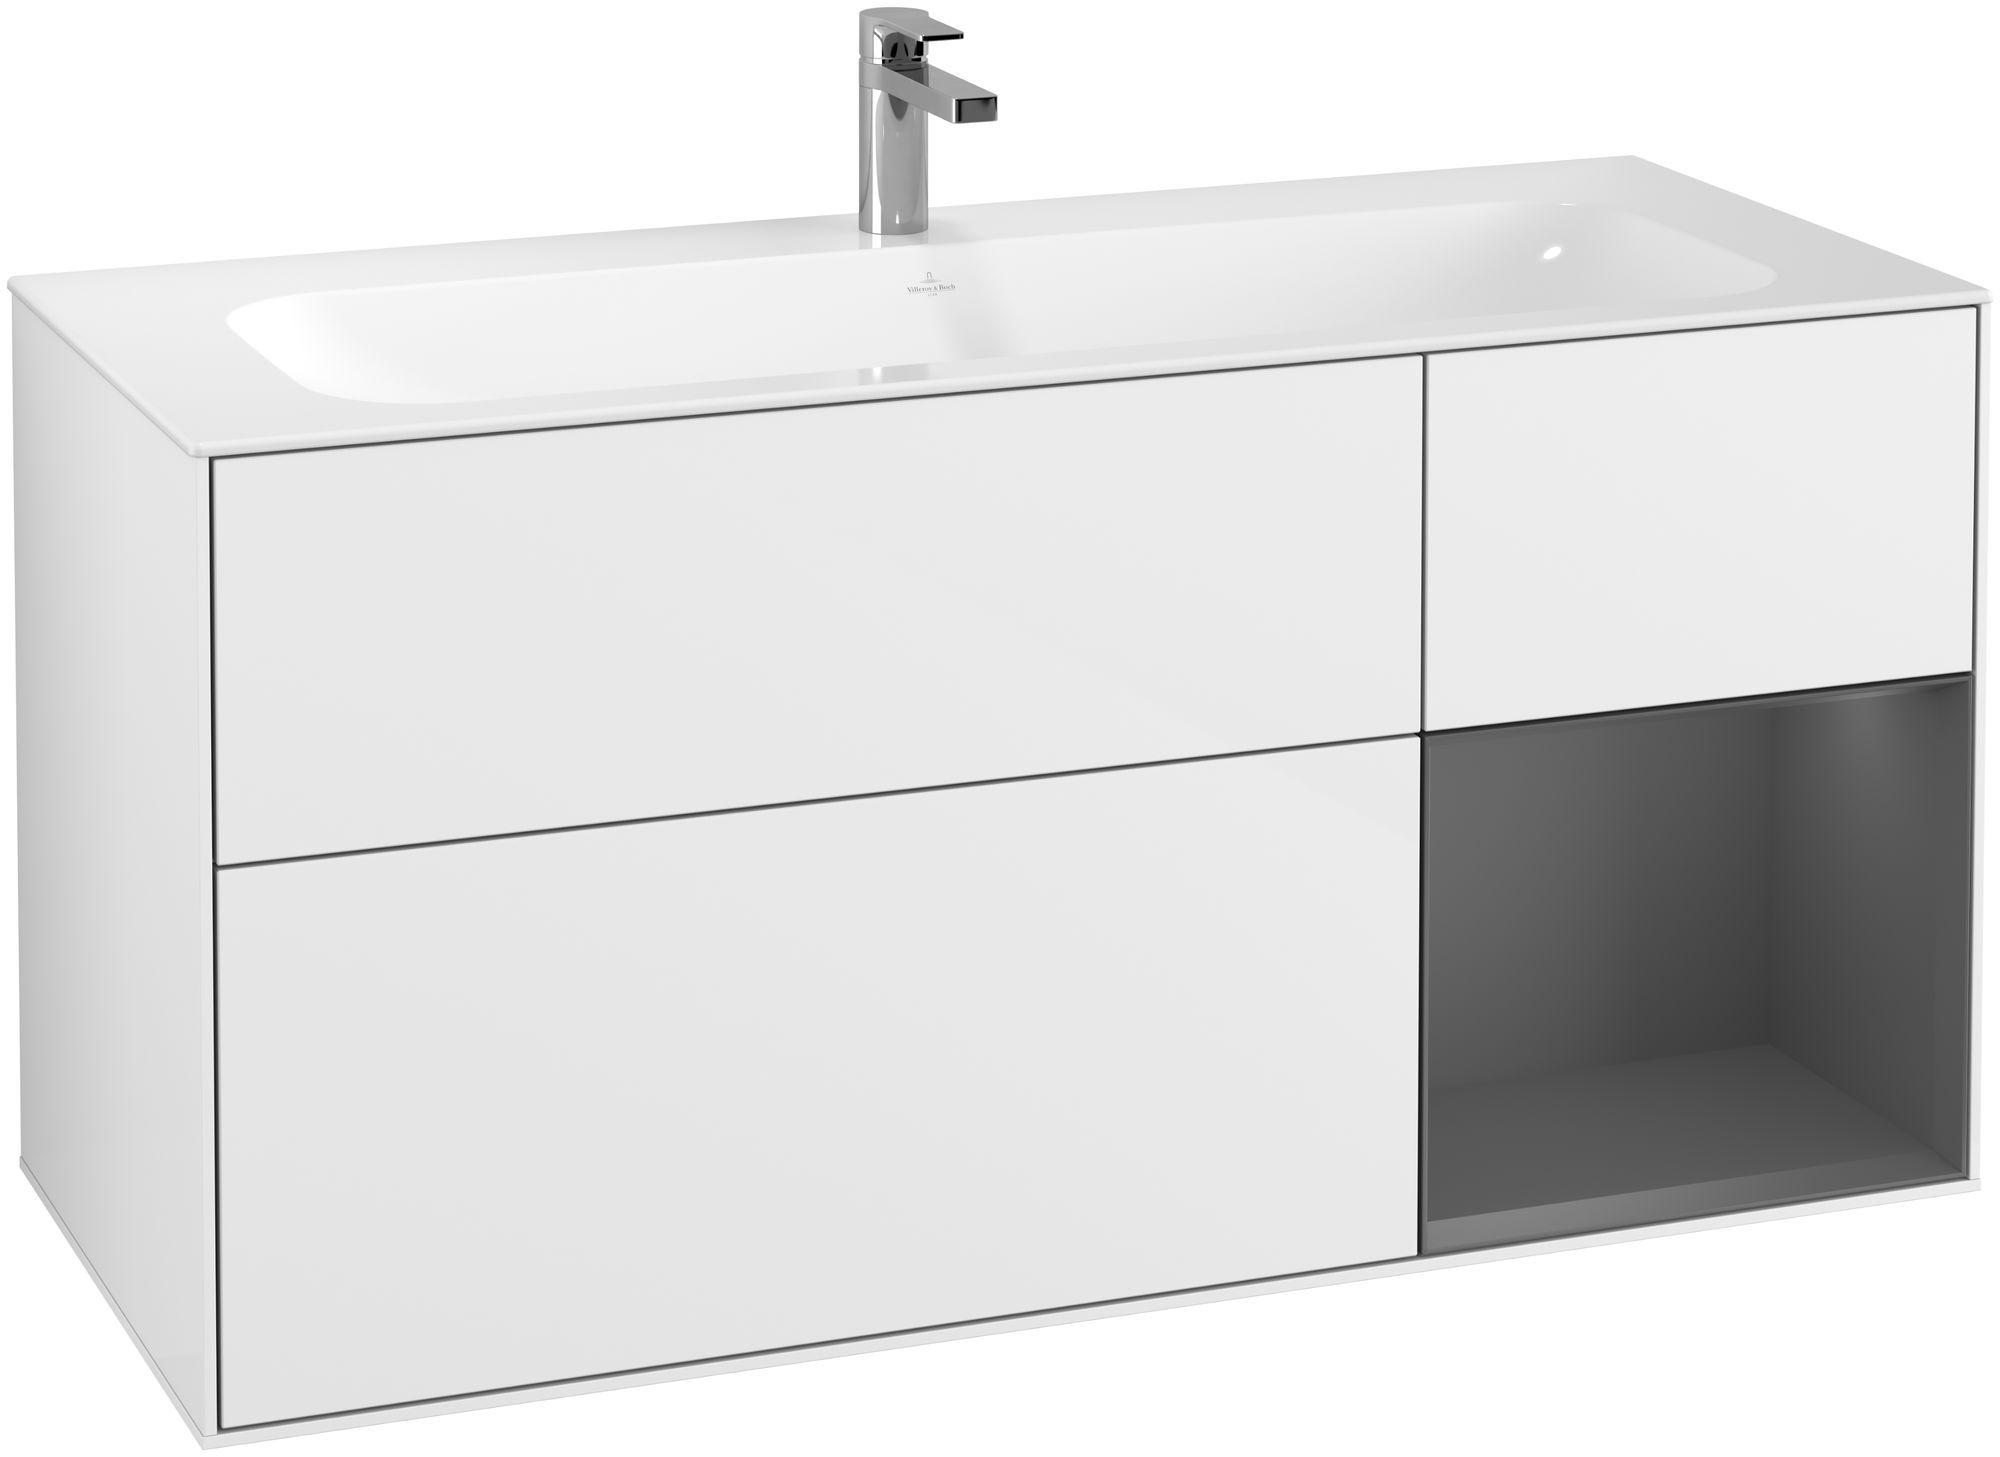 Villeroy & Boch Finion G07 Waschtischunterschrank mit Regalelement 3 Auszüge LED-Beleuchtung B:119,6xH:59,1xT:49,8cm Front, Korpus: Glossy White Lack, Regal: Anthracite Matt G070GKGF